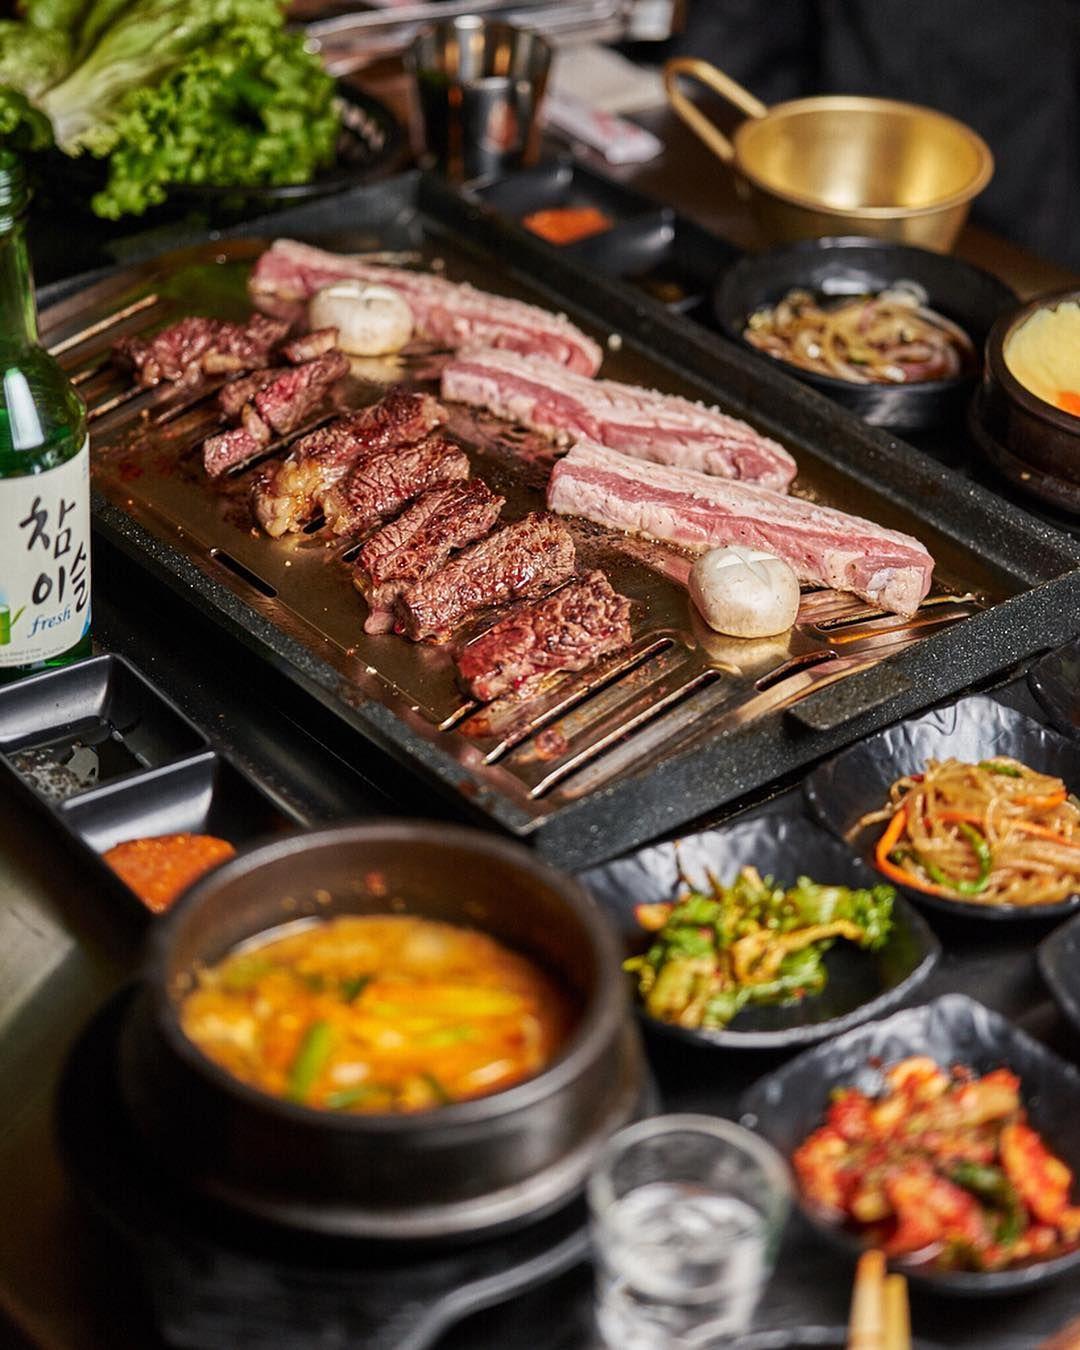 Busangalmaegibbq Is Toronto S New Spot For Korean Bbq Bbqto Opticalmealfinder Korean Bbq Bbq Food